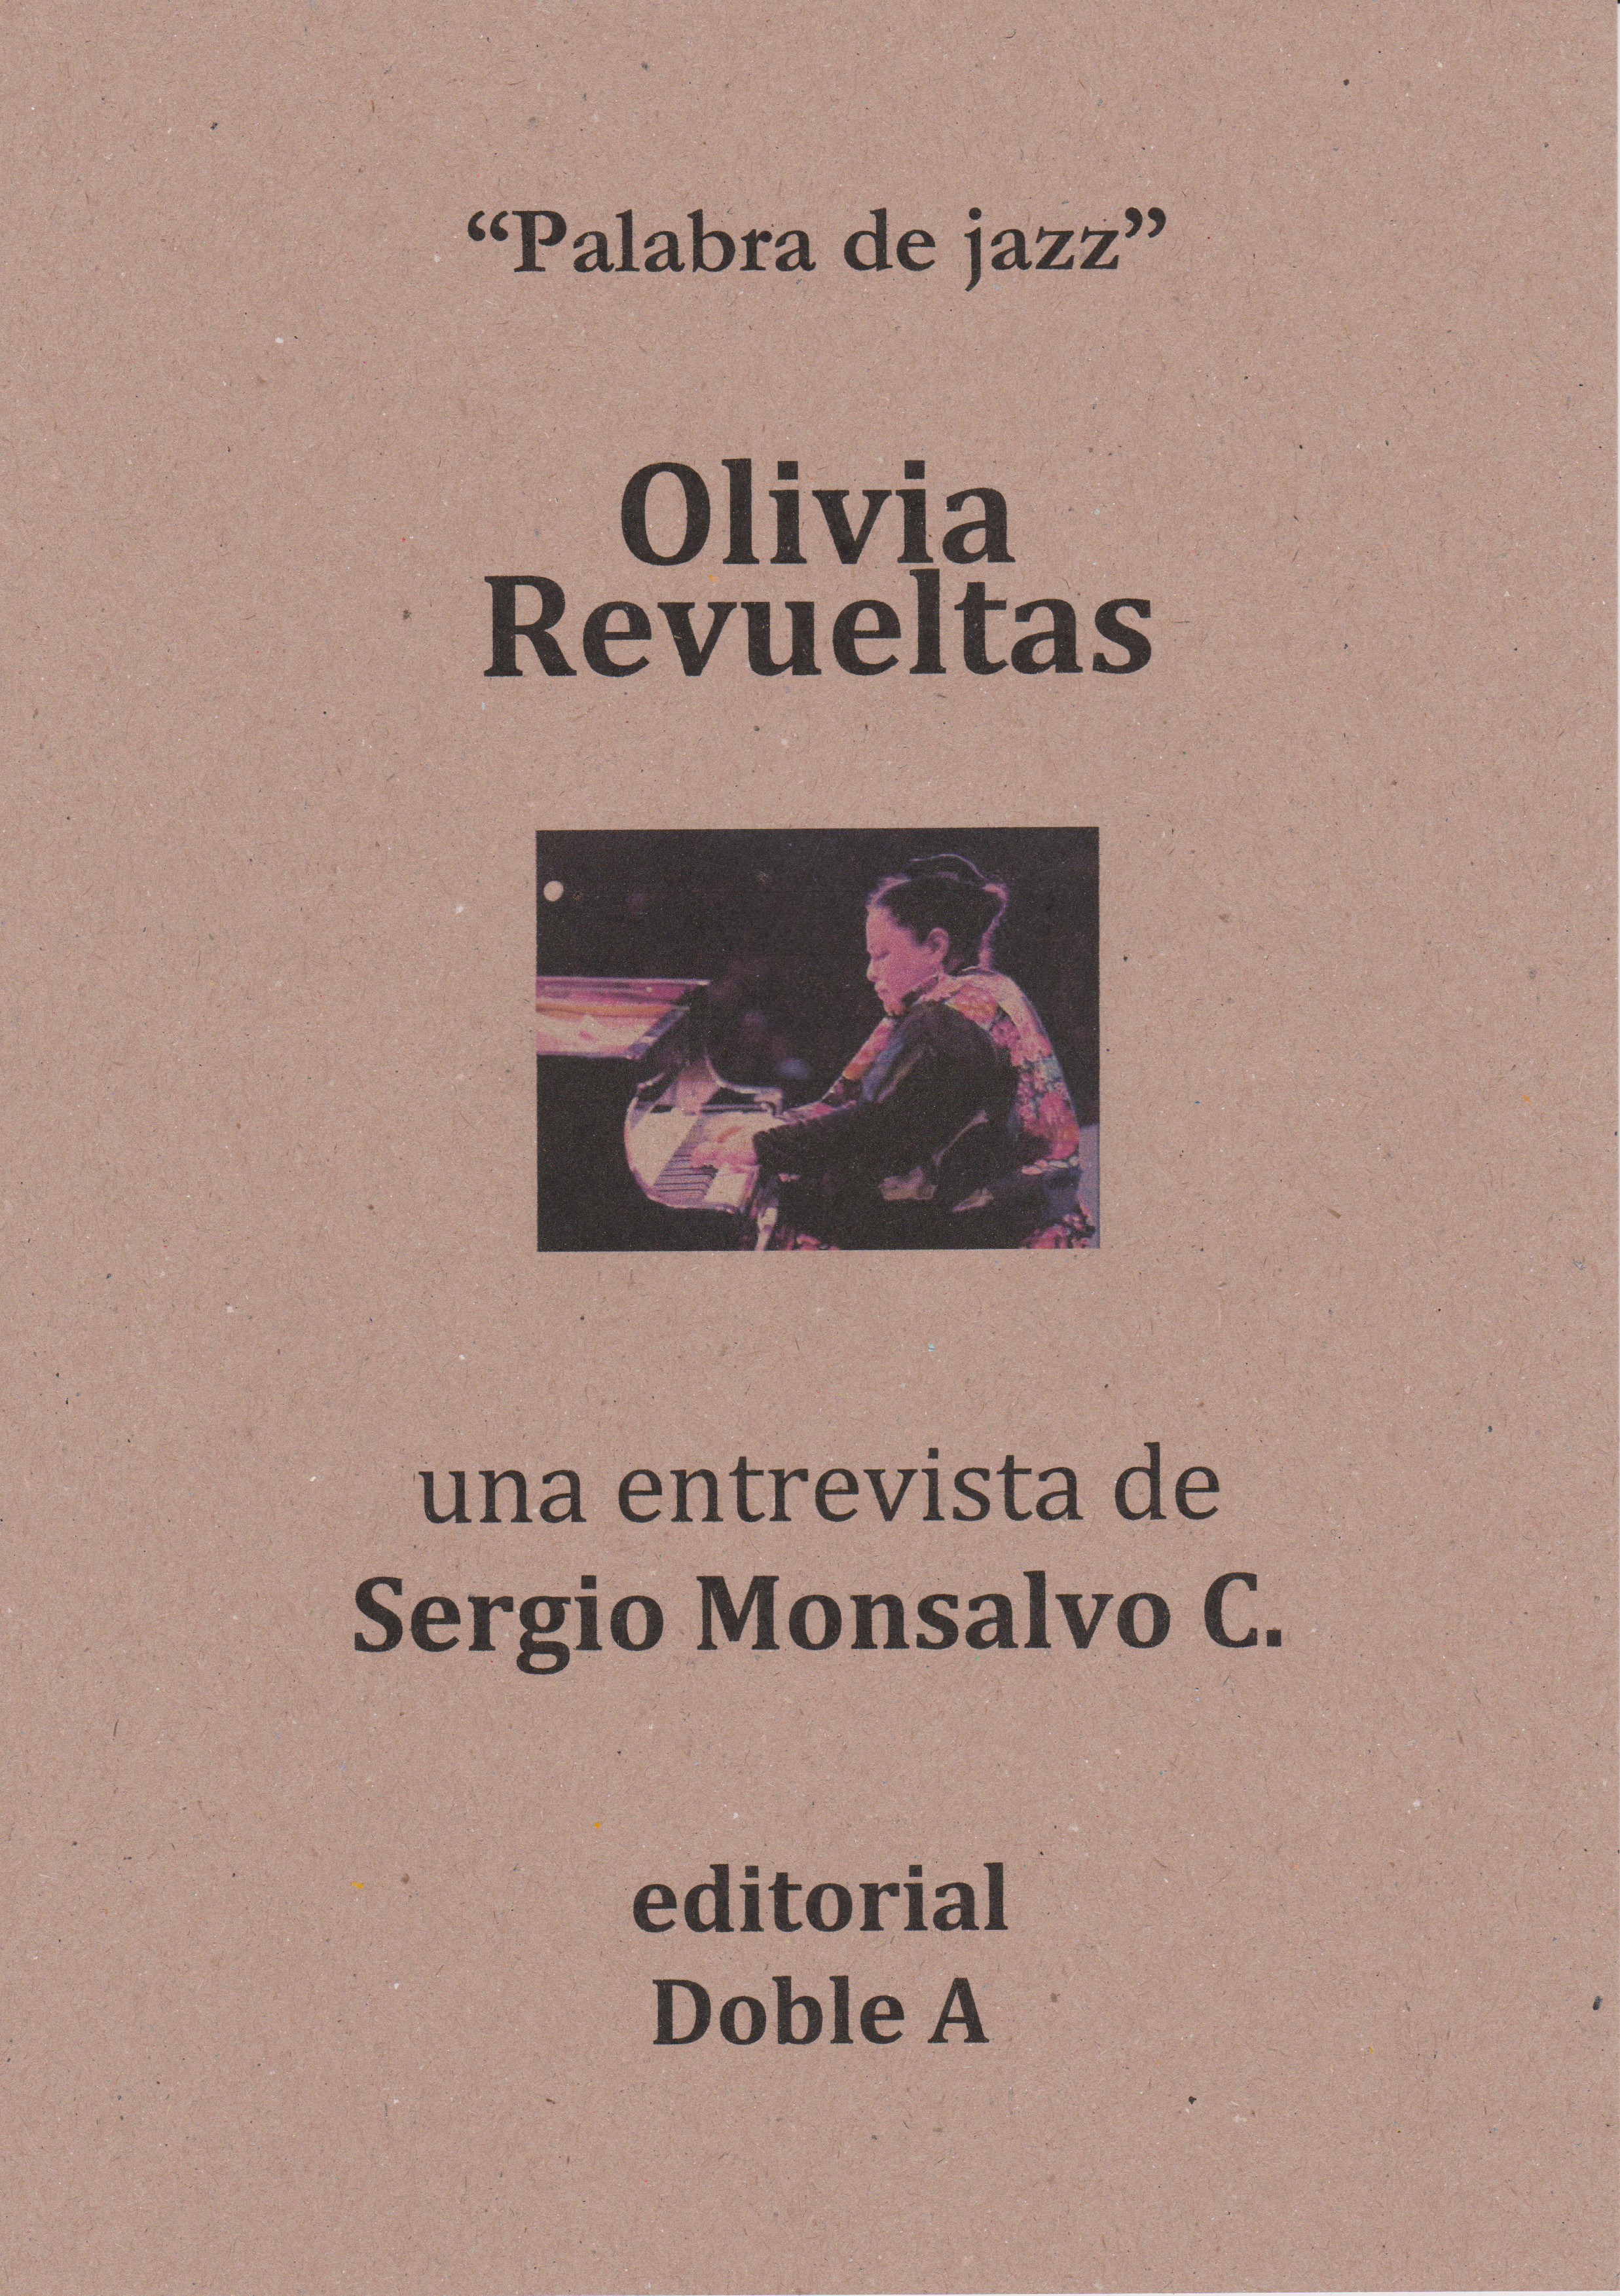 OLIVIA REVUELTAS (PORTADA)